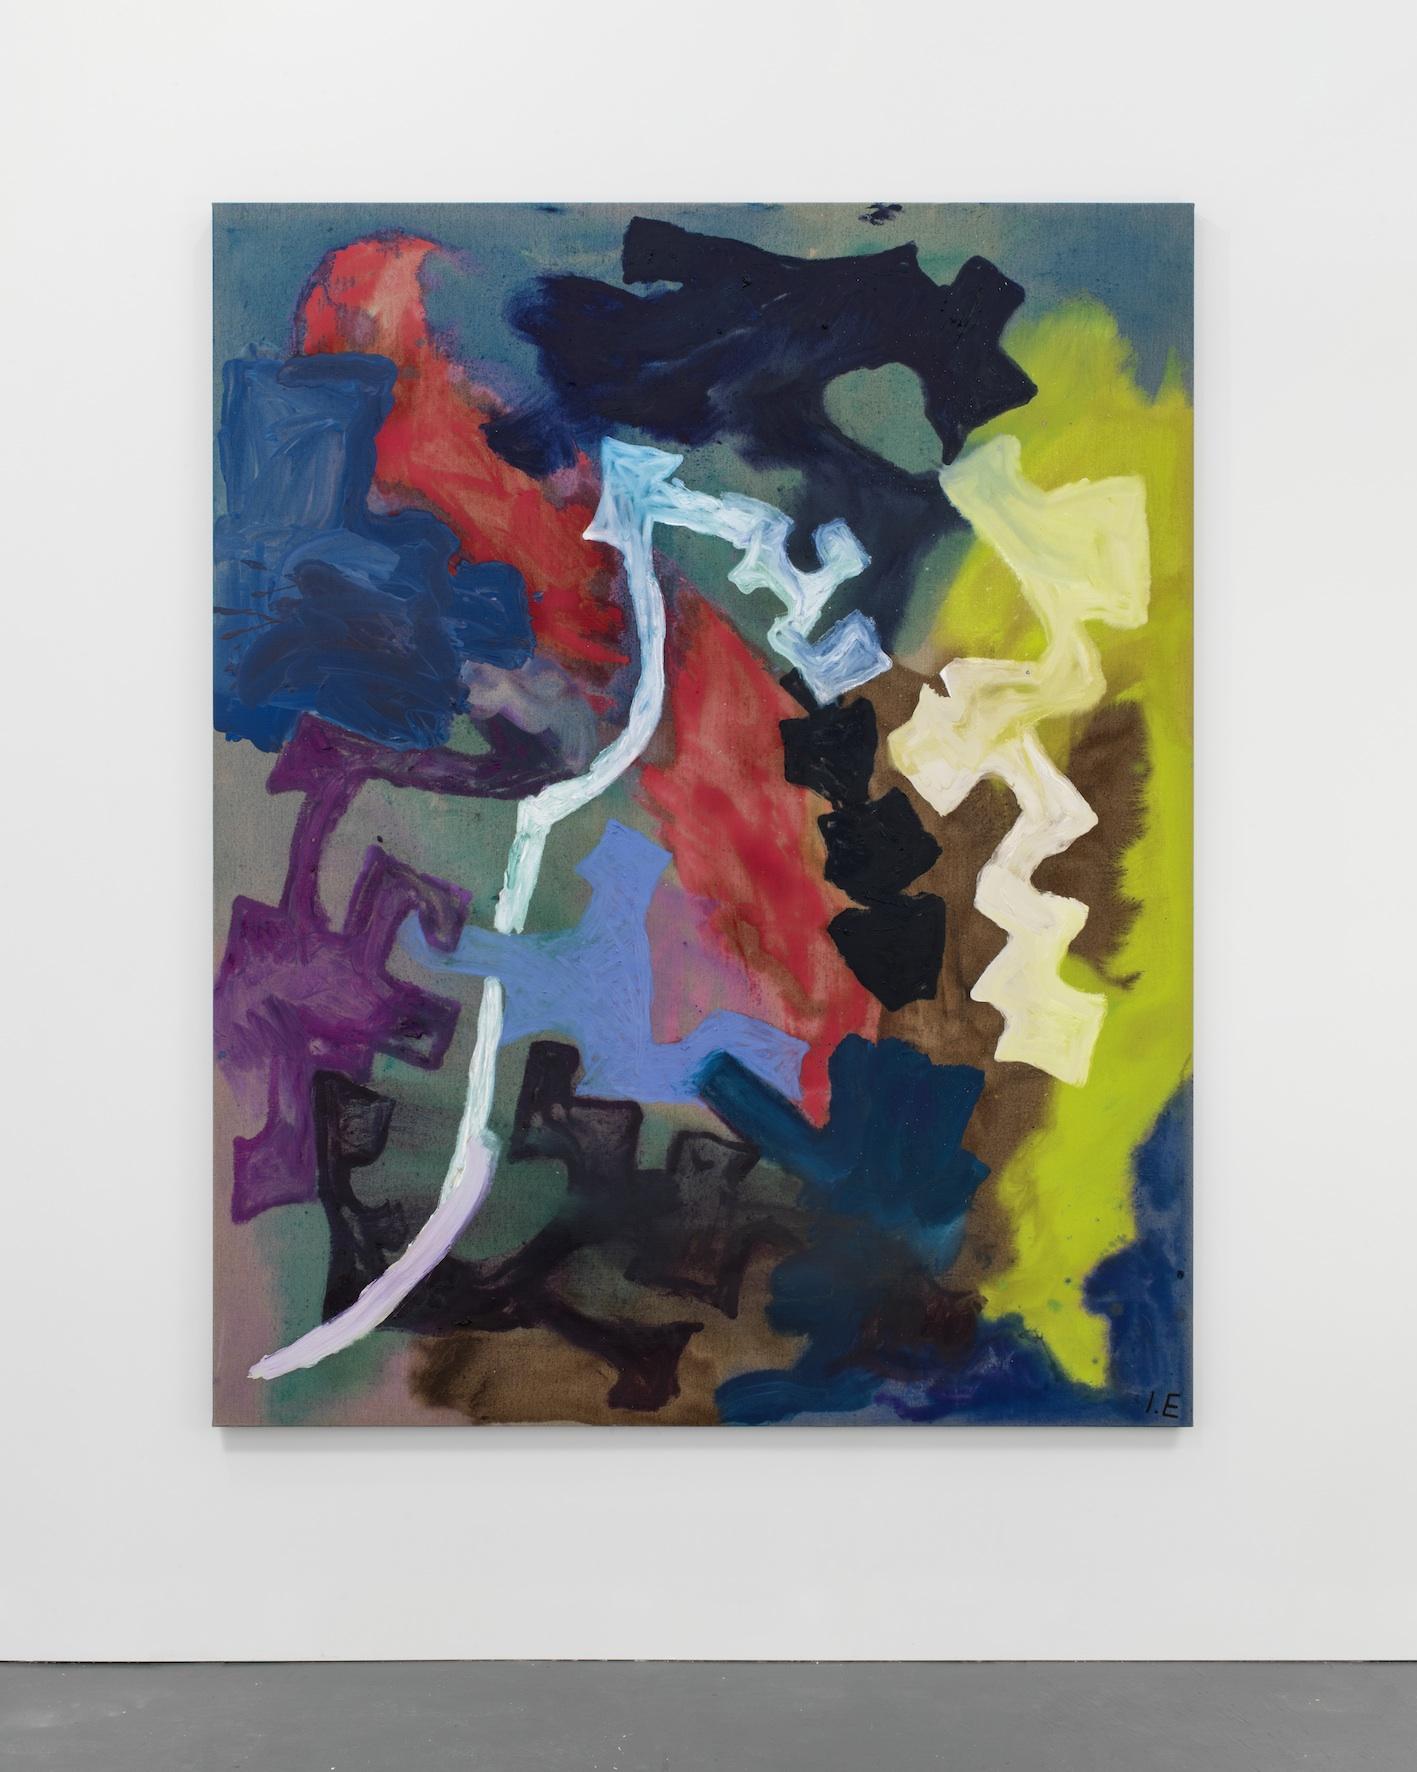 Grifter's Theater  2013  Oil on linen  200 x 160 cm / 78.7 x 62.9 in